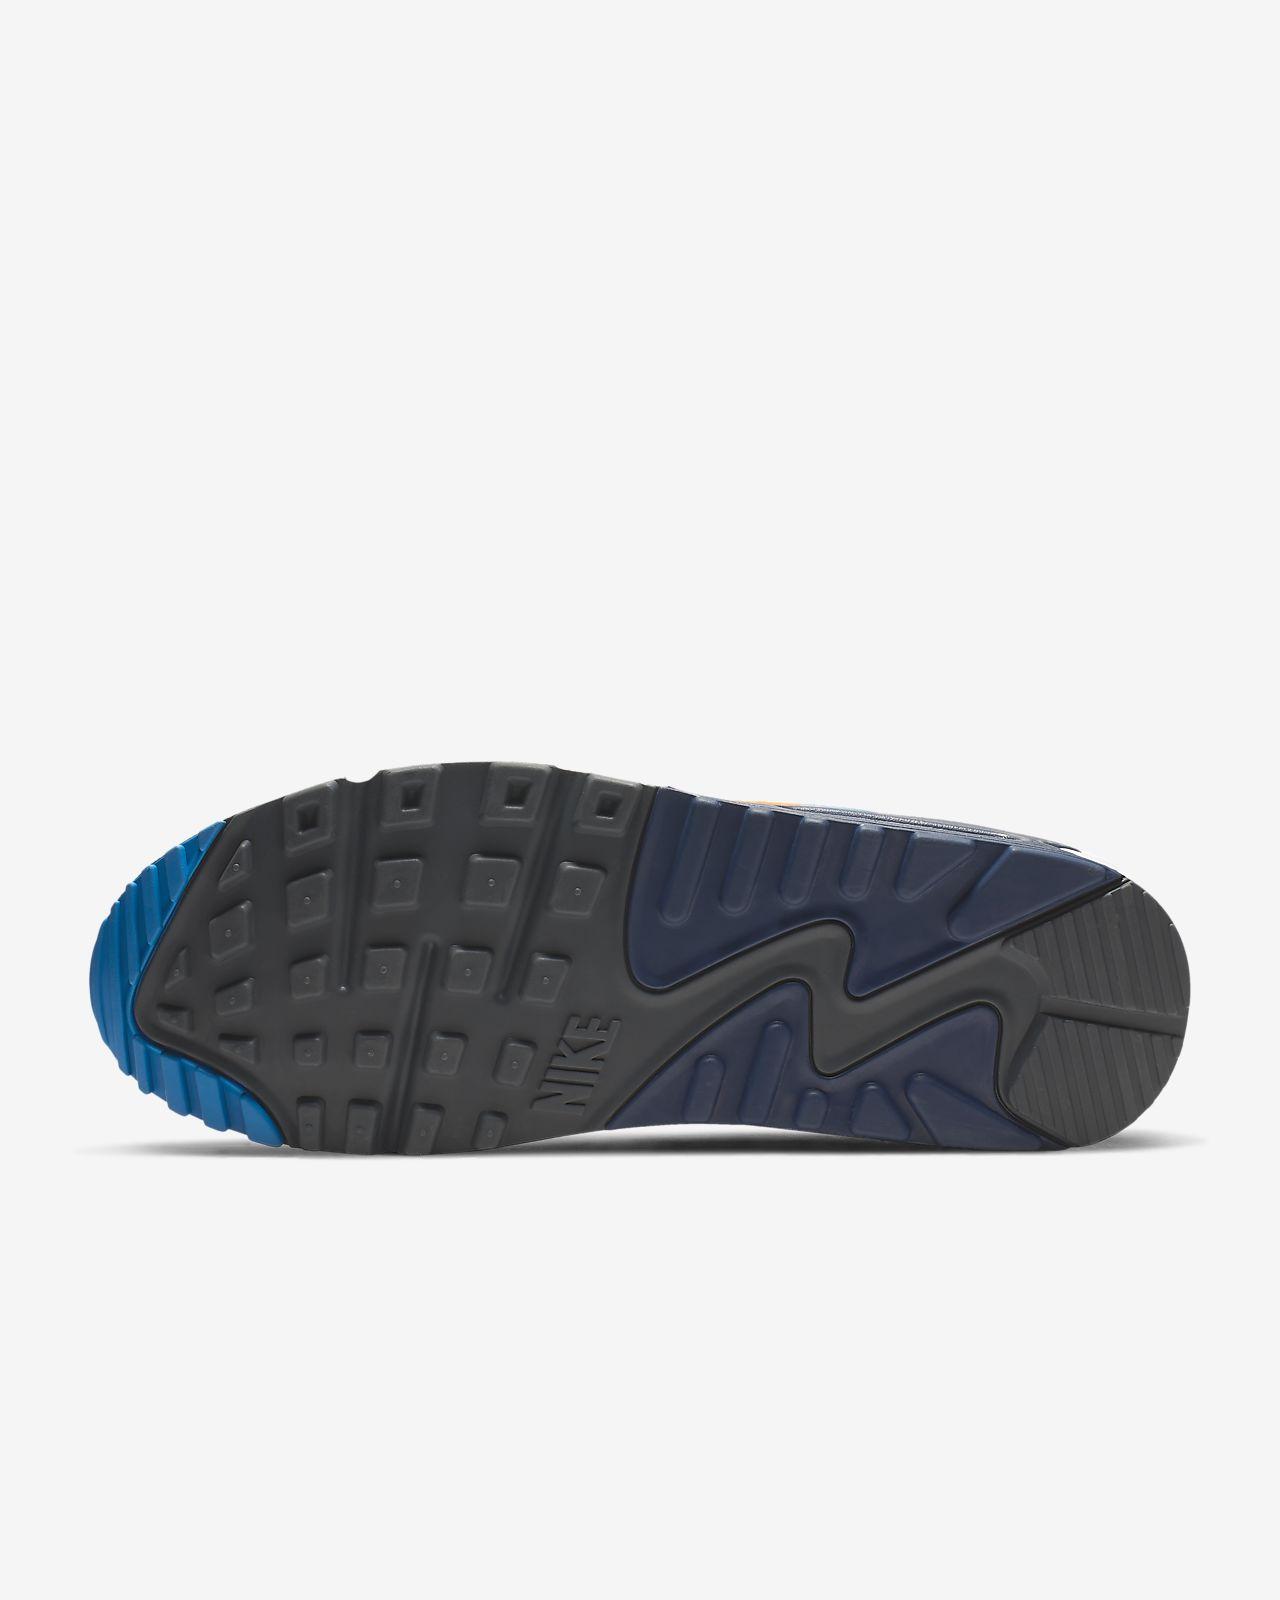 Cloudfoam Surco Para Zapatos Adidas Gris Hombre Neo lKFT1Jc